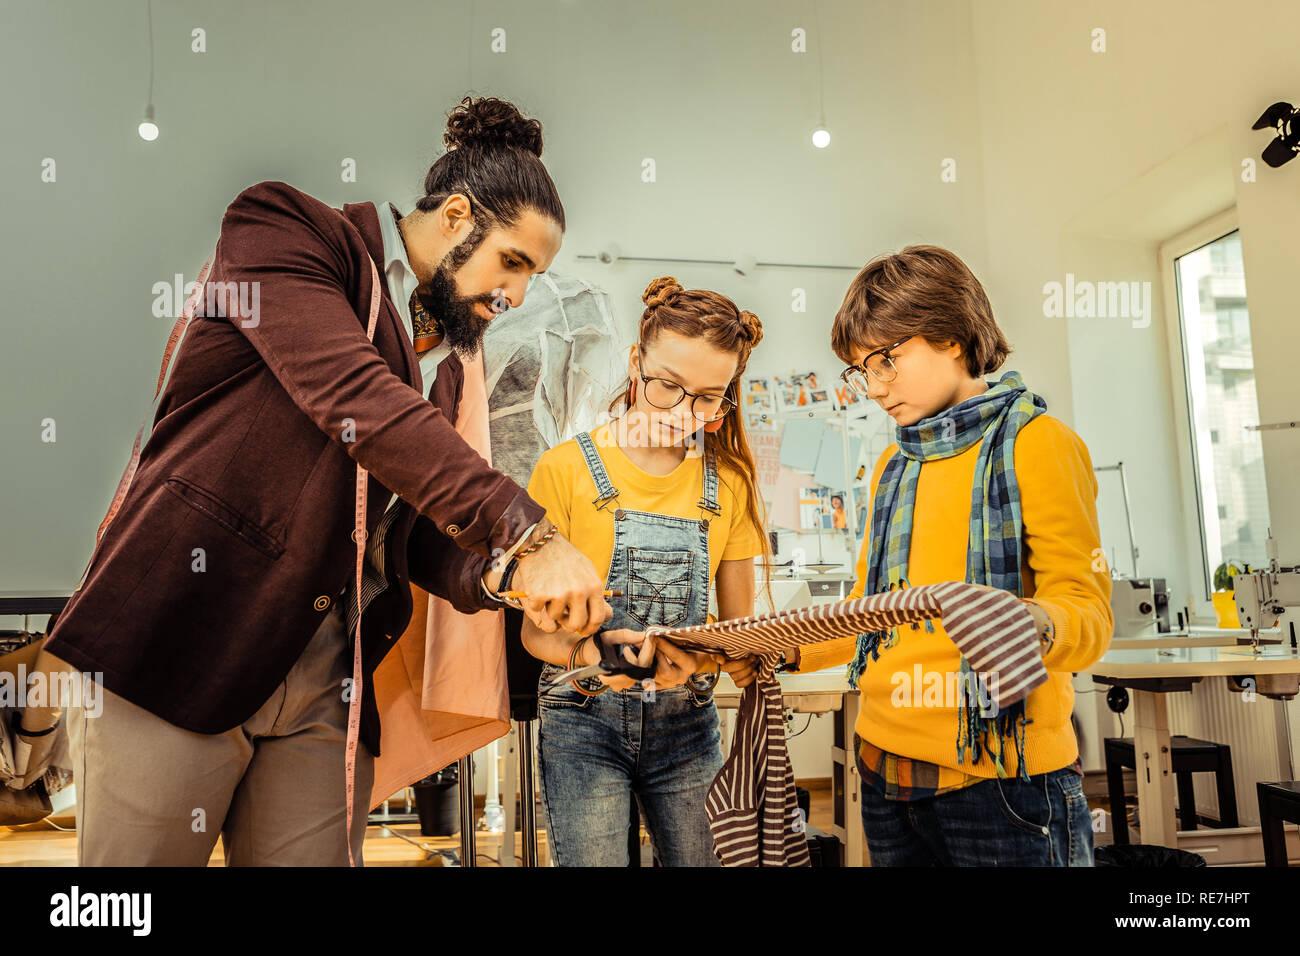 Bearded Fashion Designer Teaching Children Cutting Fabric Stock Photo Alamy